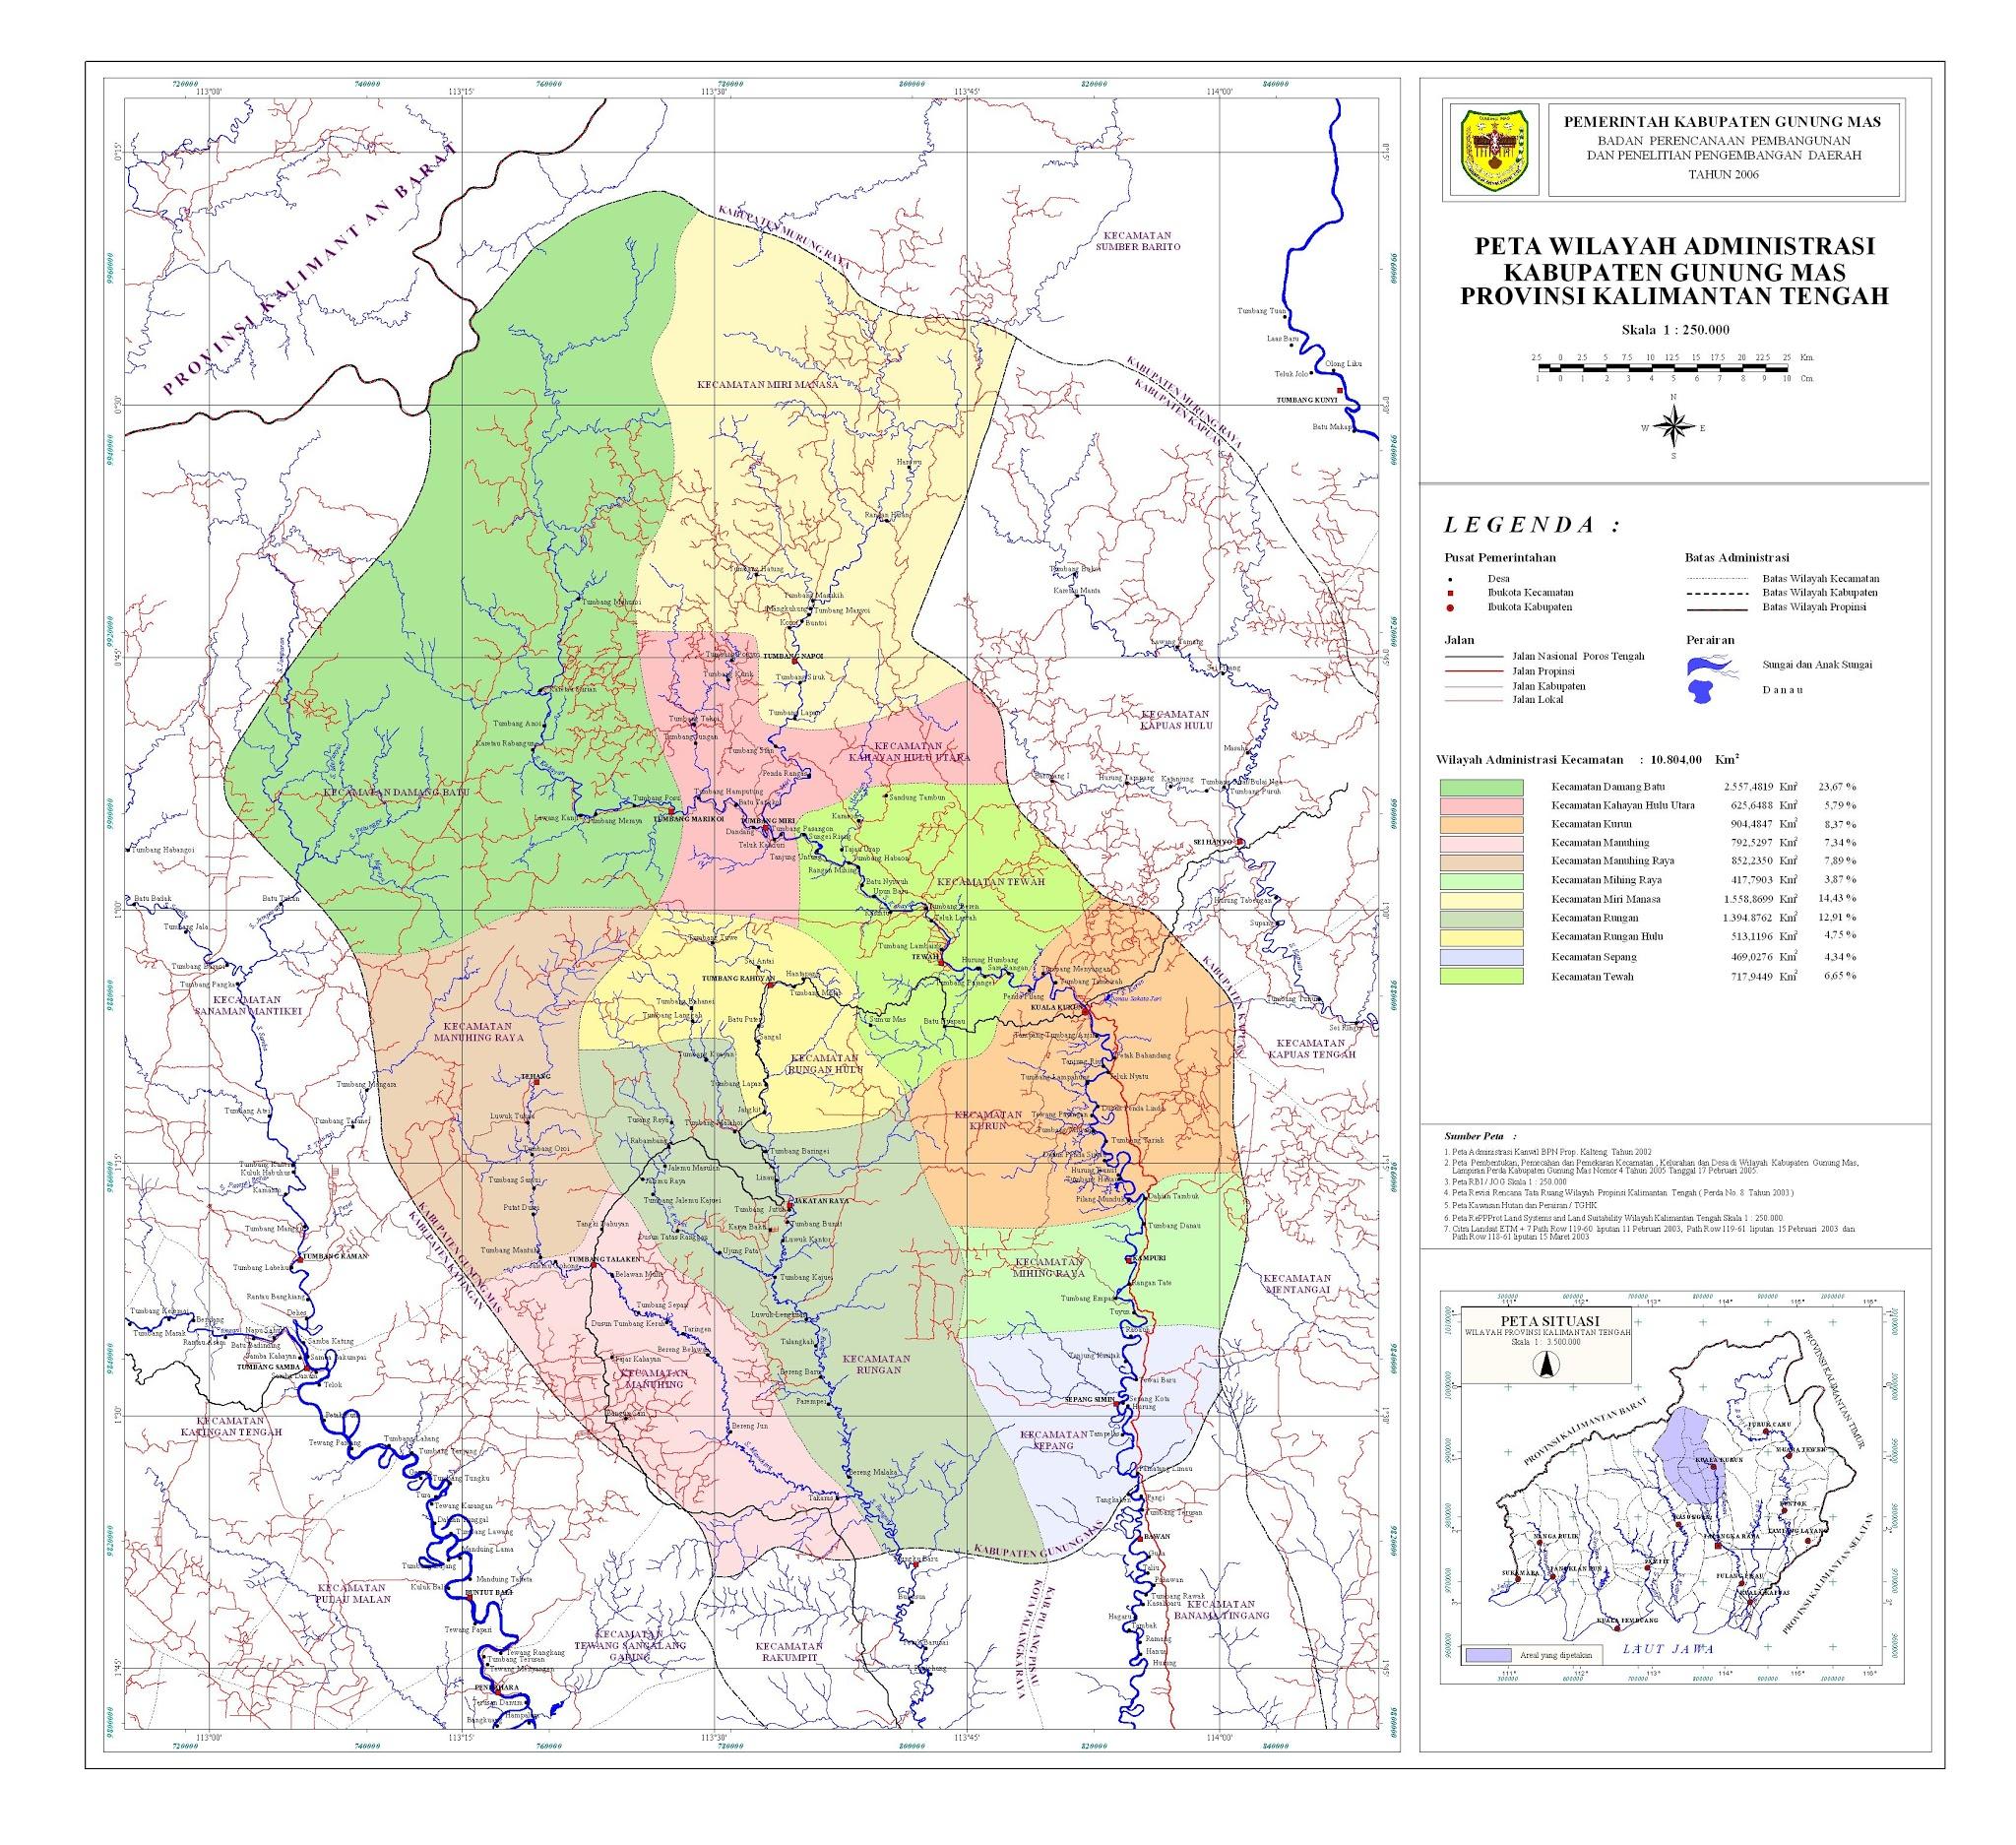 Peta Kota: Peta Kabupaten Gunung Mas